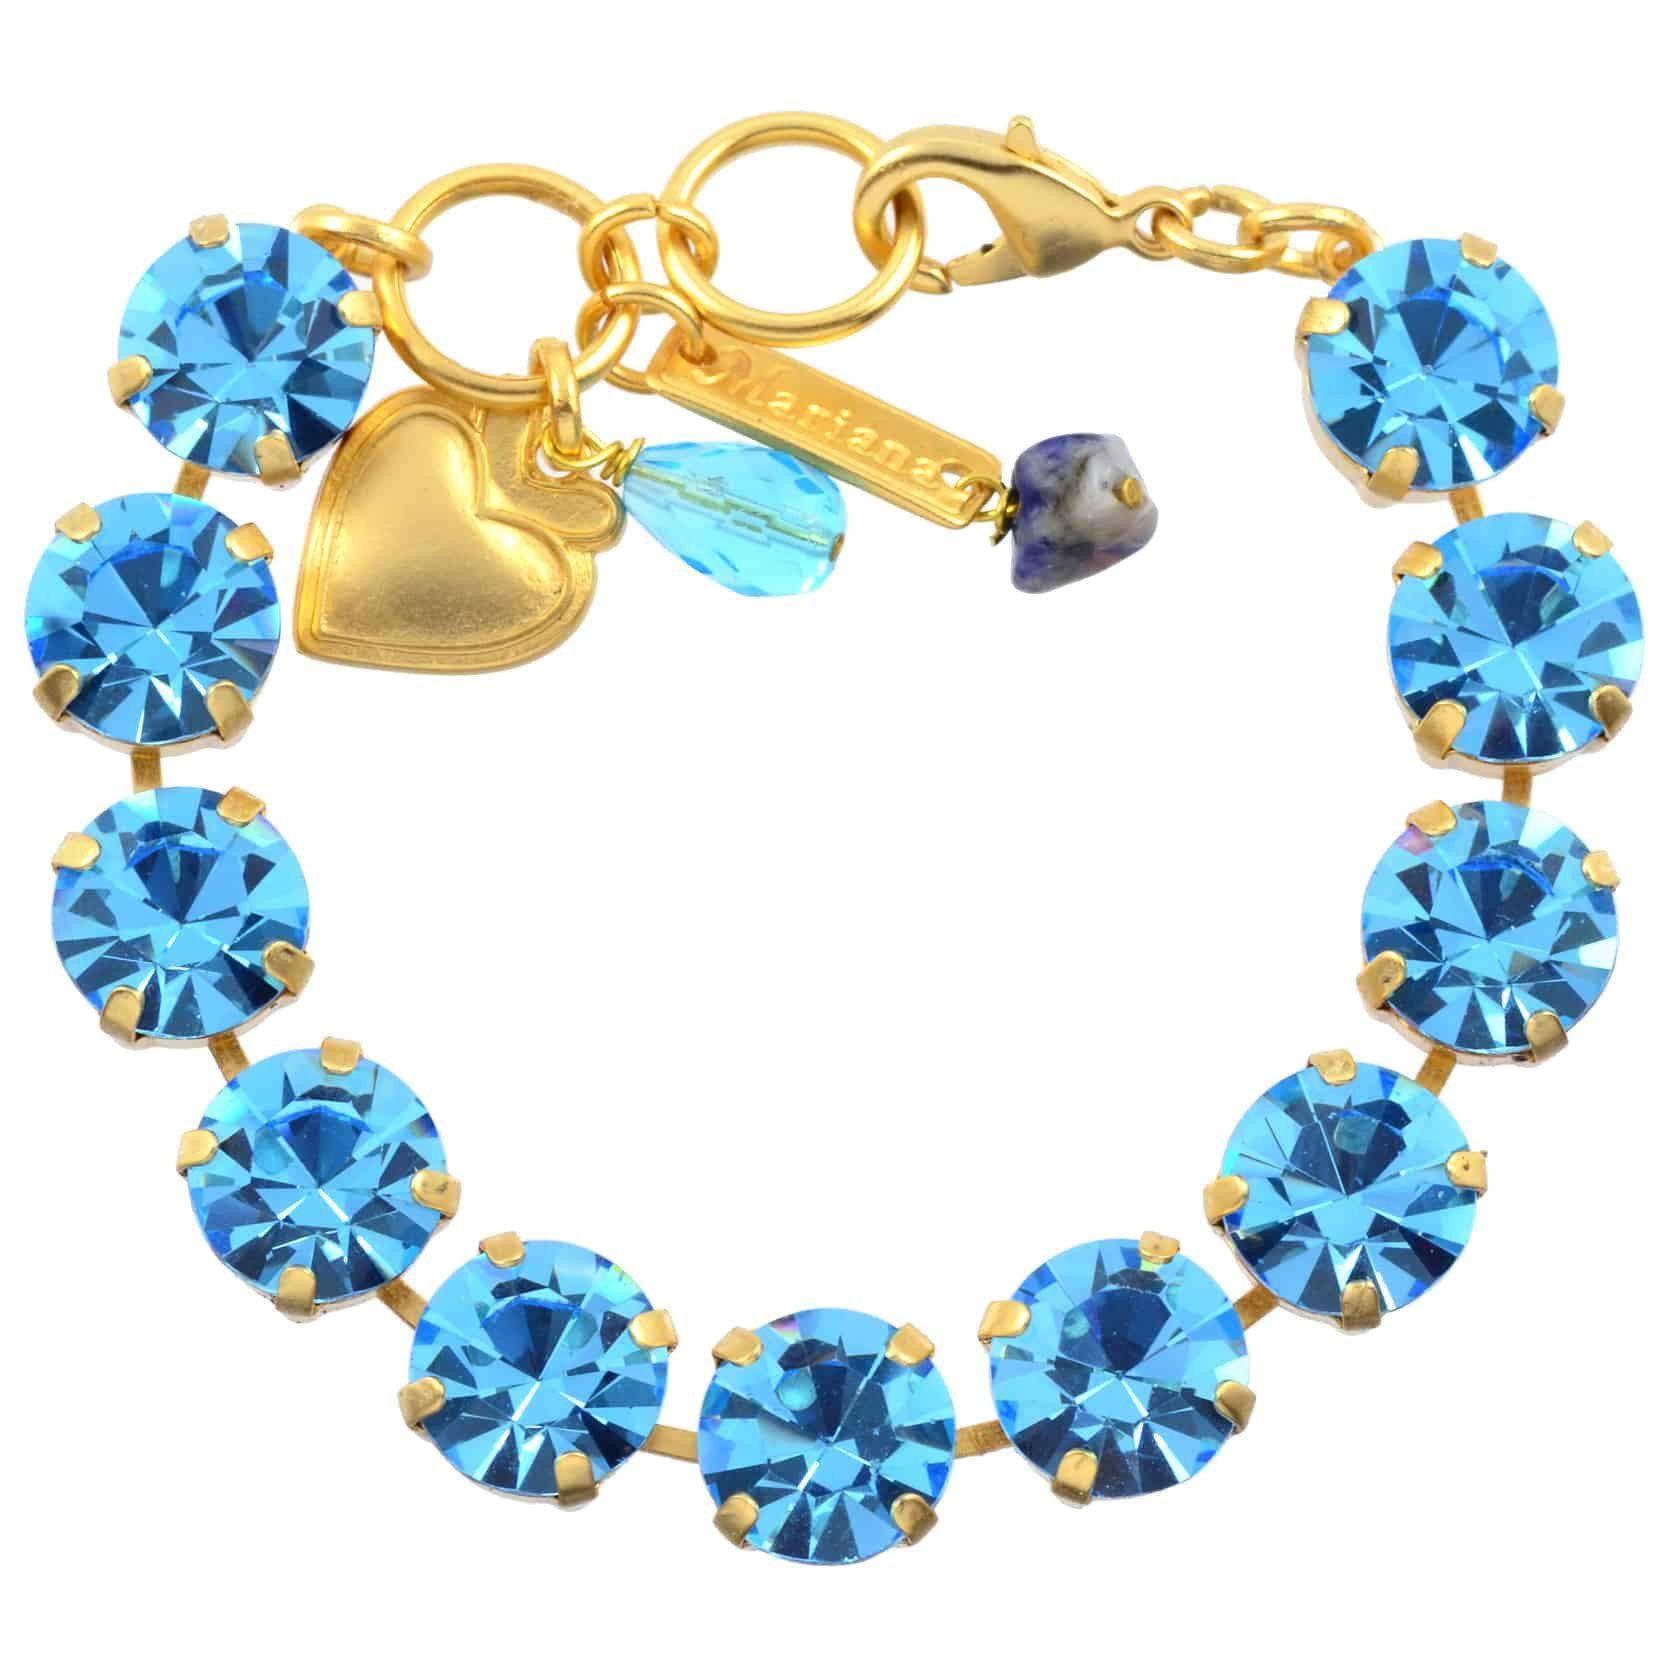 Mariana large tennis bracelet gold plated with aqua swarovski